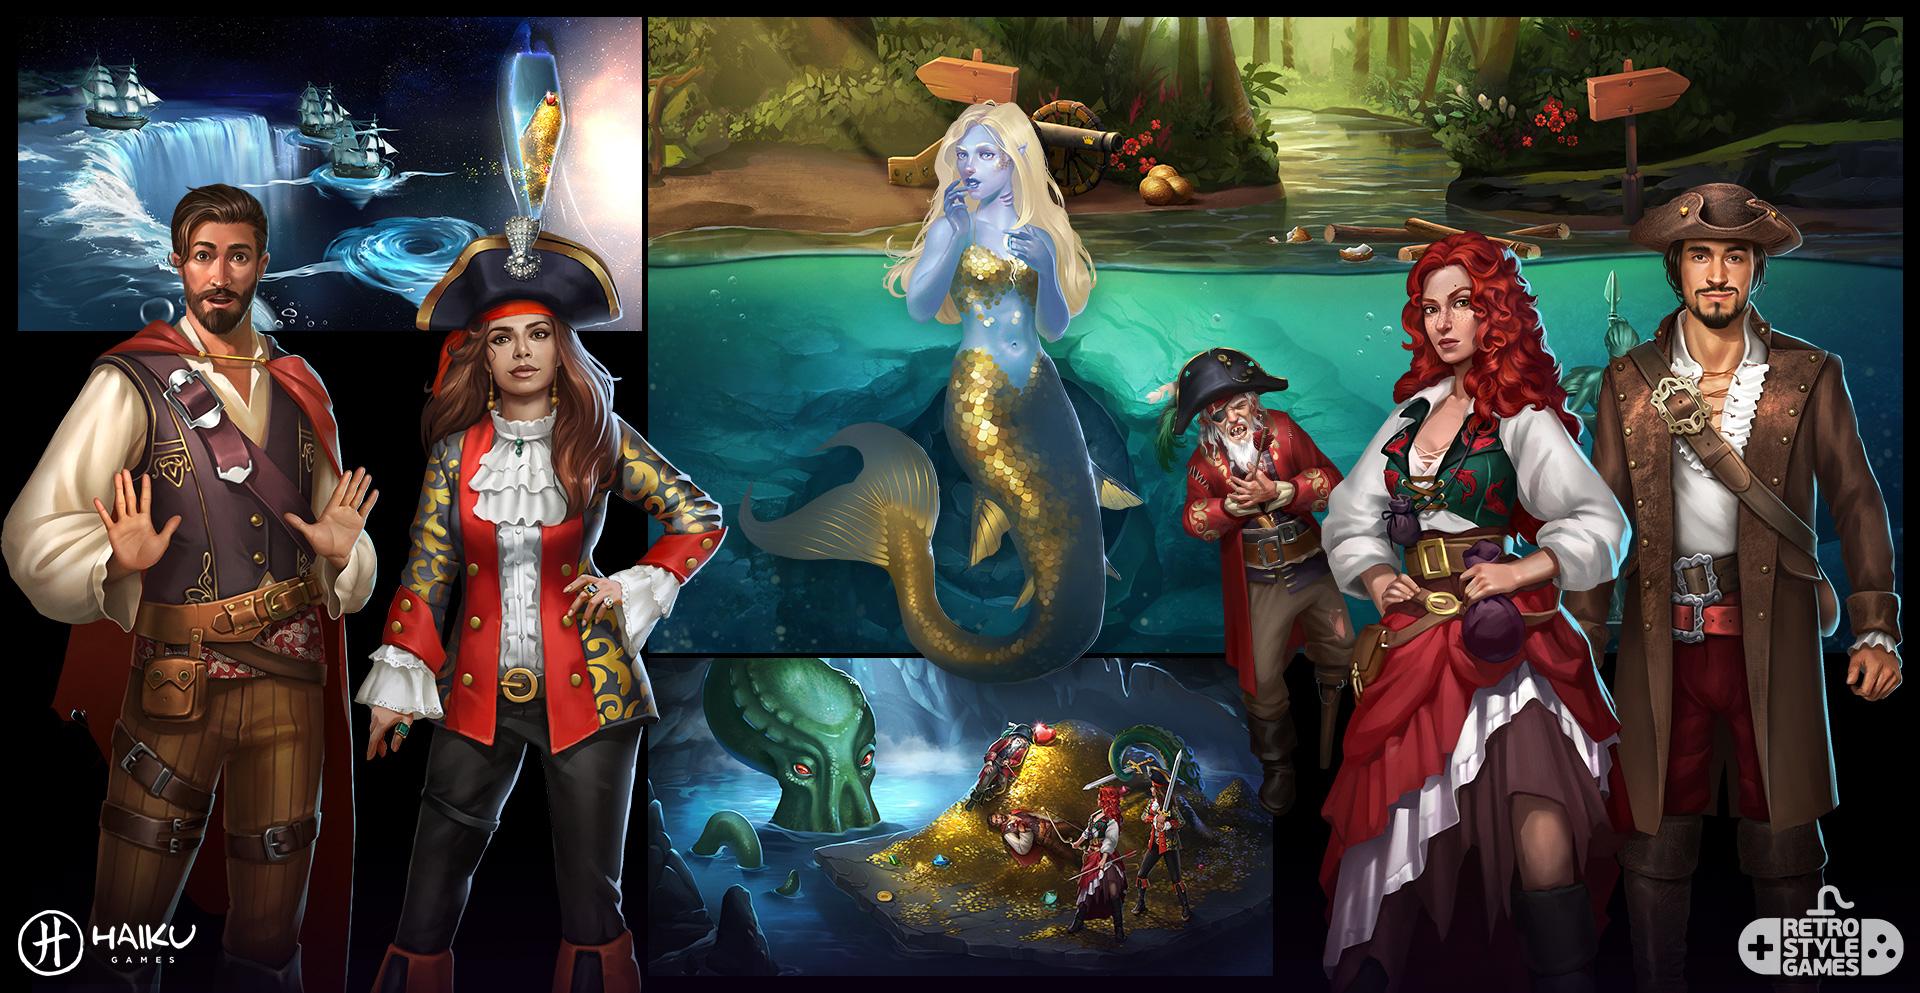 Haiku 2D Character Background Pirate Treasure Sea of Thieves